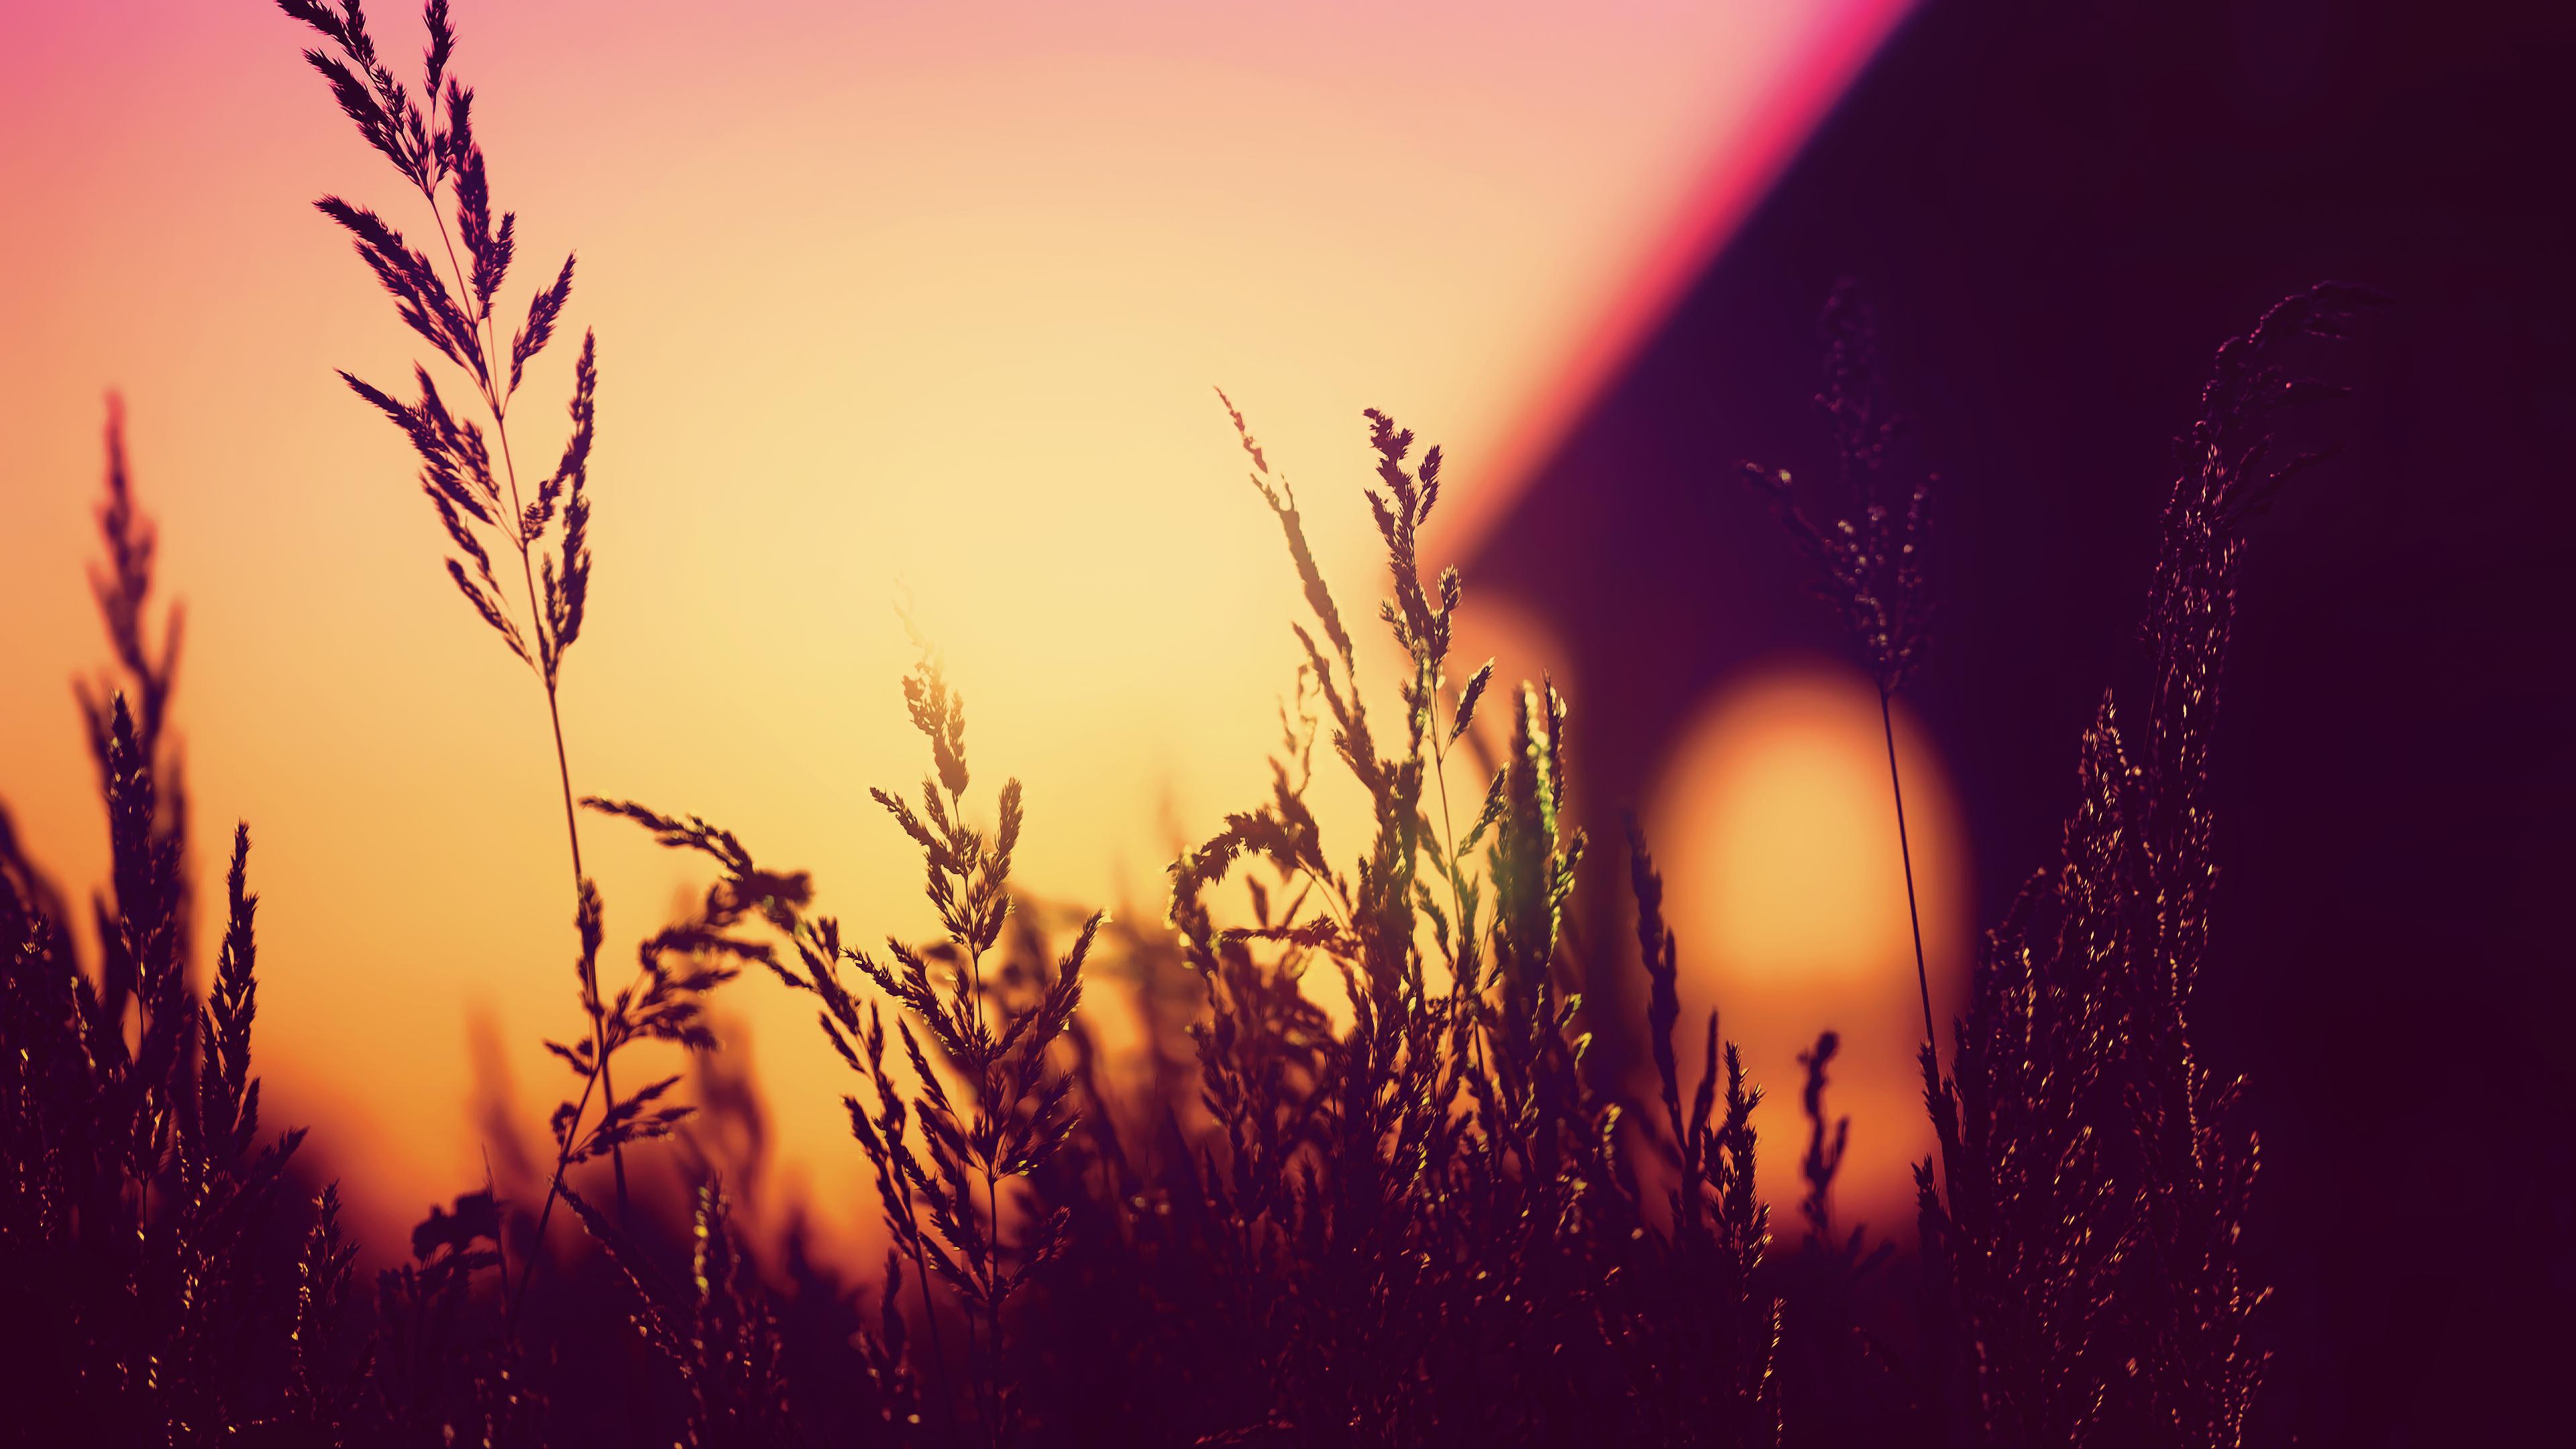 Plants Blurred Silhouette Sunset 4k, HD Nature, 4k